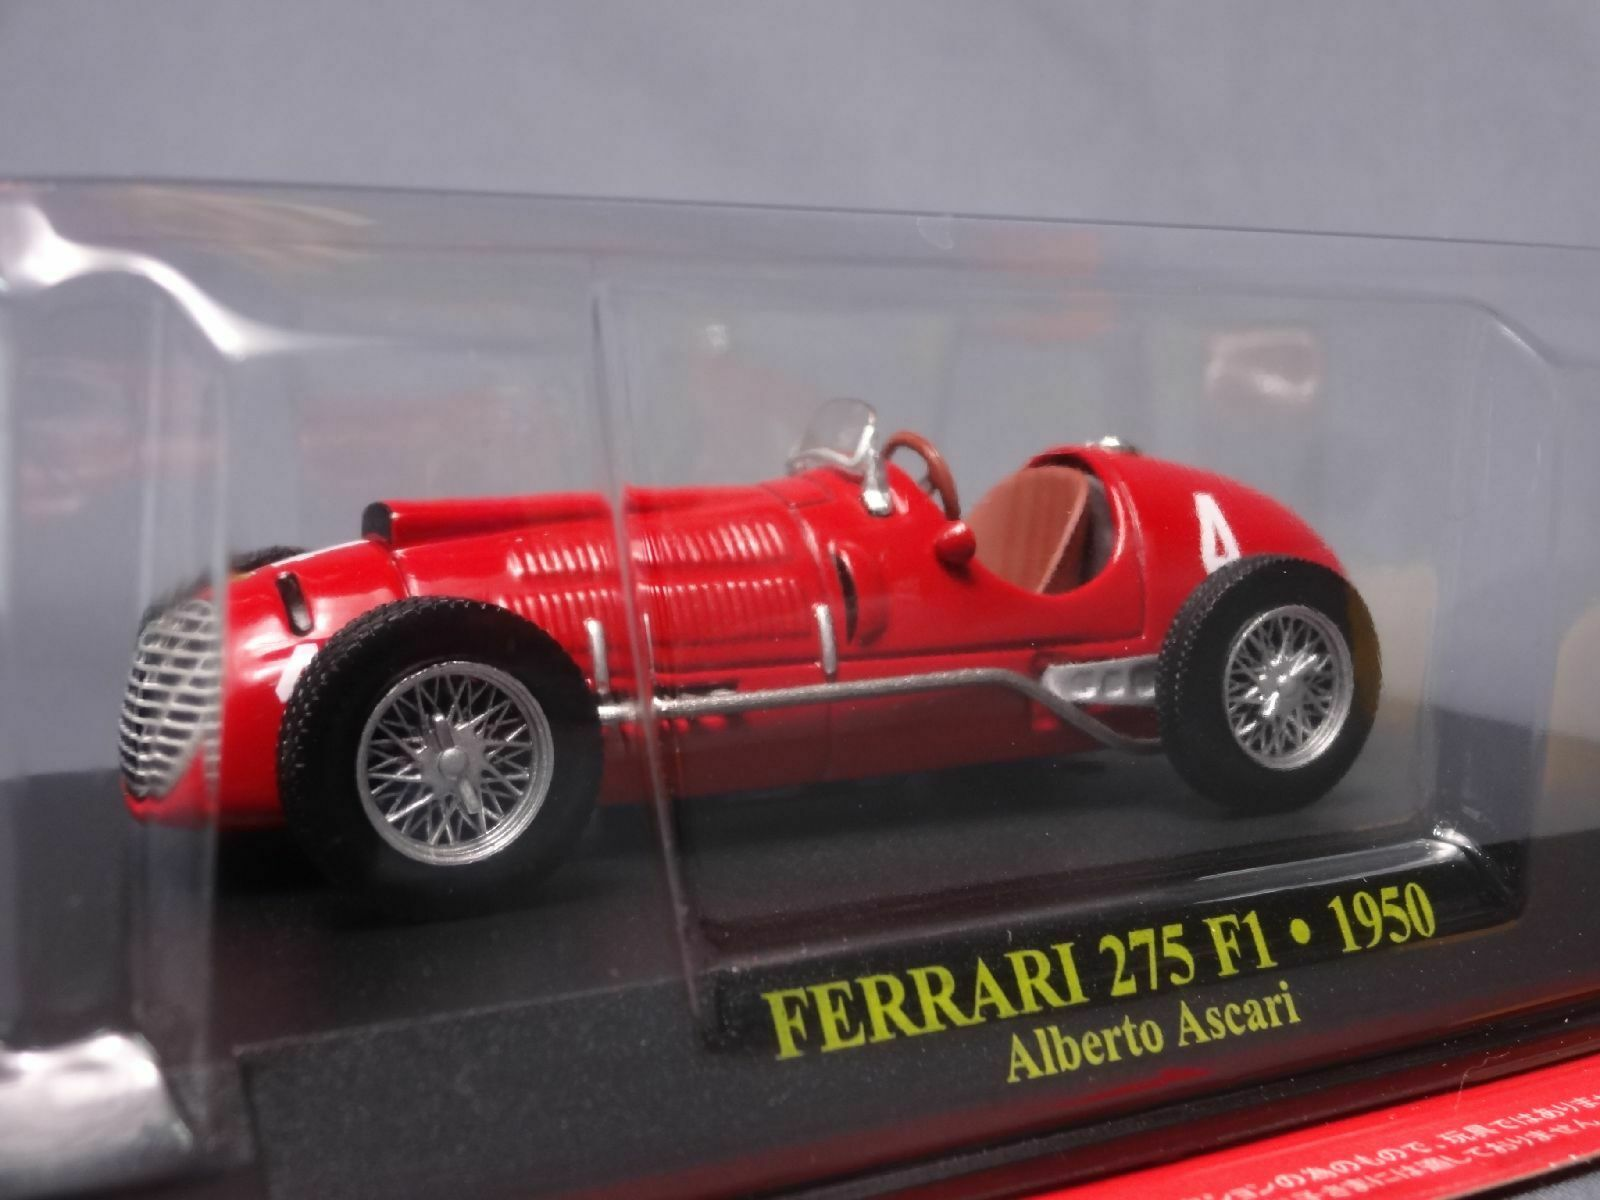 Ferrari Collection F1 275 1950 Alberto échelle 1 43 Mini Voiture Affichage Diecast 37